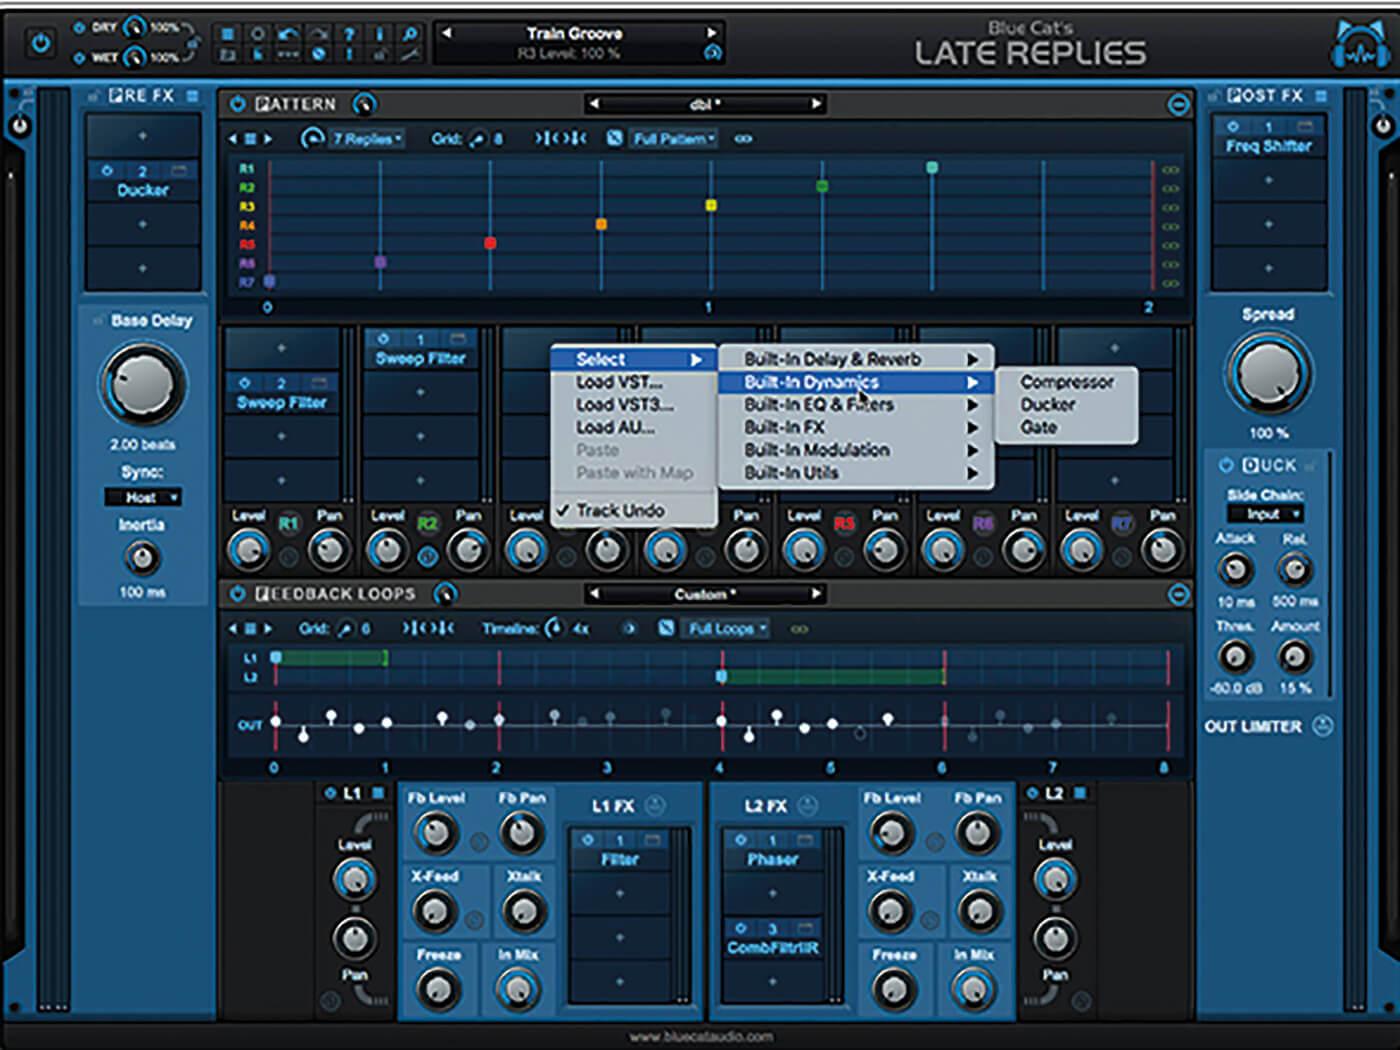 Blue Cat Audio Late Replies